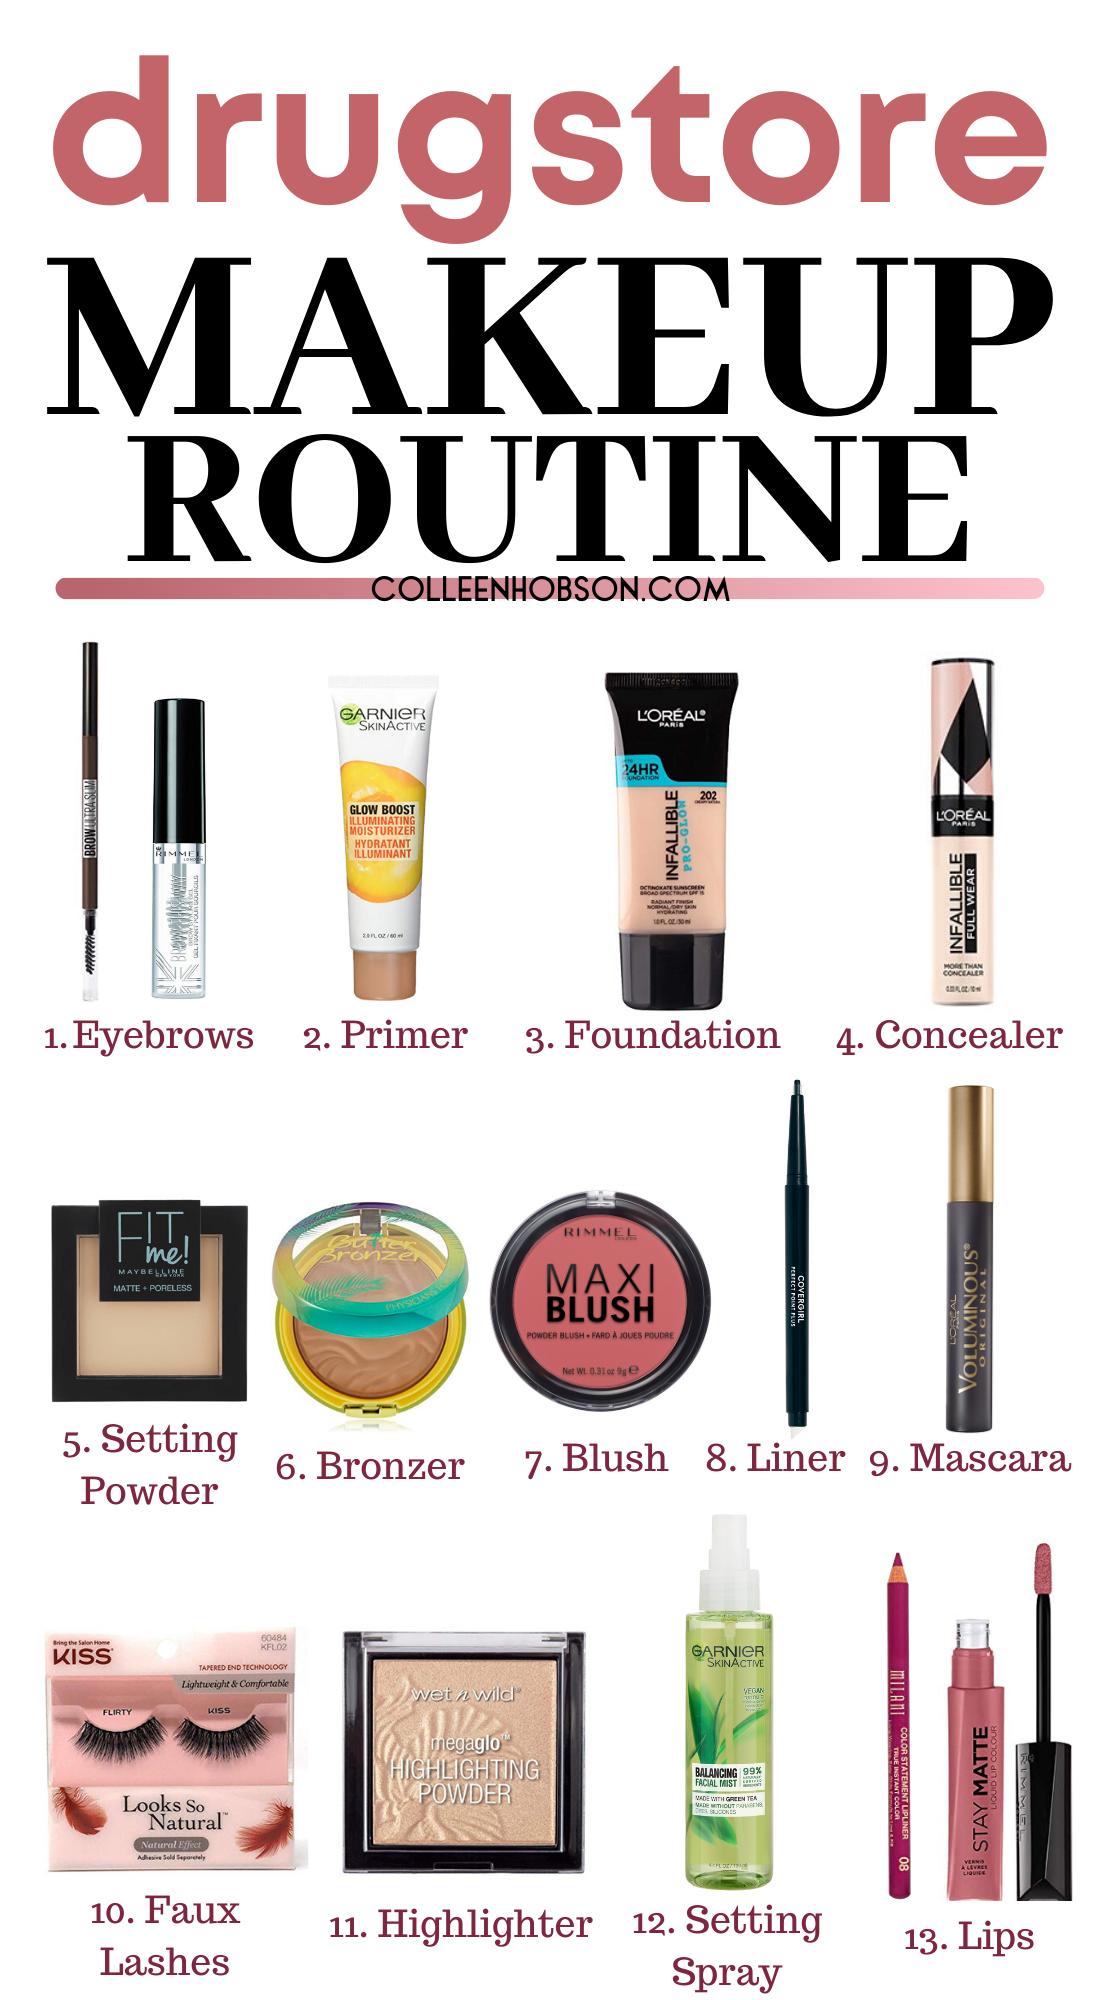 Drugstore Makeup Routine Full Face Tutorial Colleen Hobson In 2020 Makeup Routine Drugstore Makeup Drugstore Makeup Tutorial